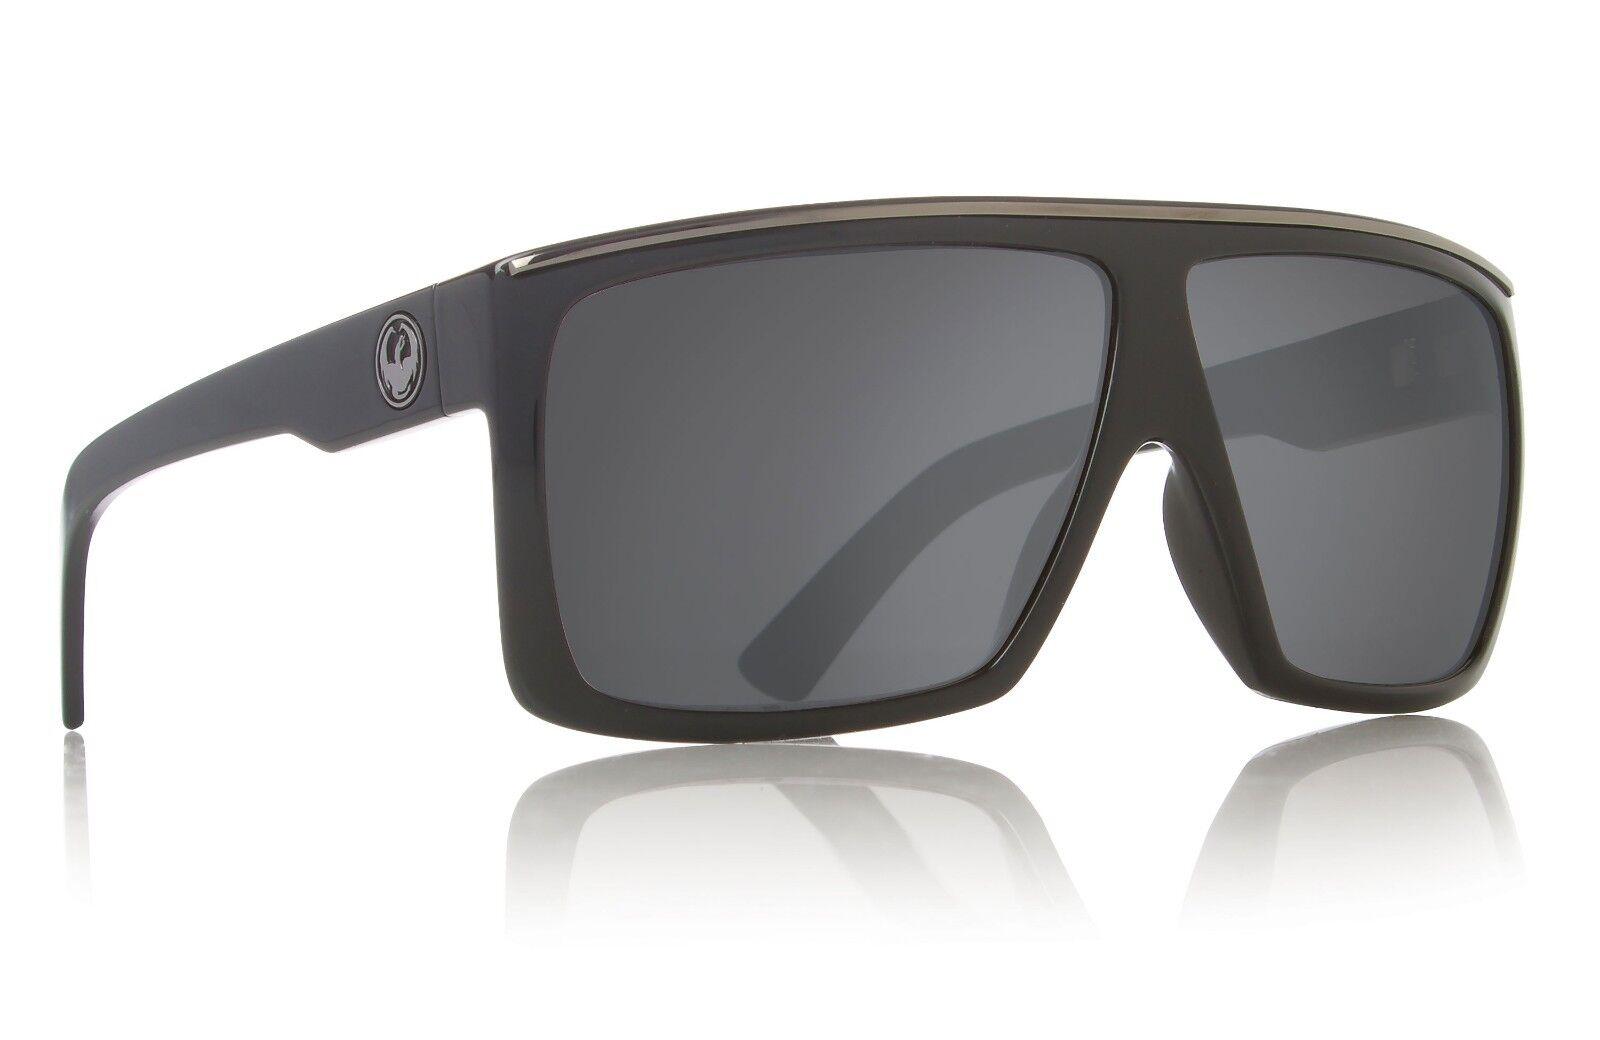 Authentic Dragon Alliance Fame Sunglasses Jet Black Frame Grey Lens ... 8592c4deff